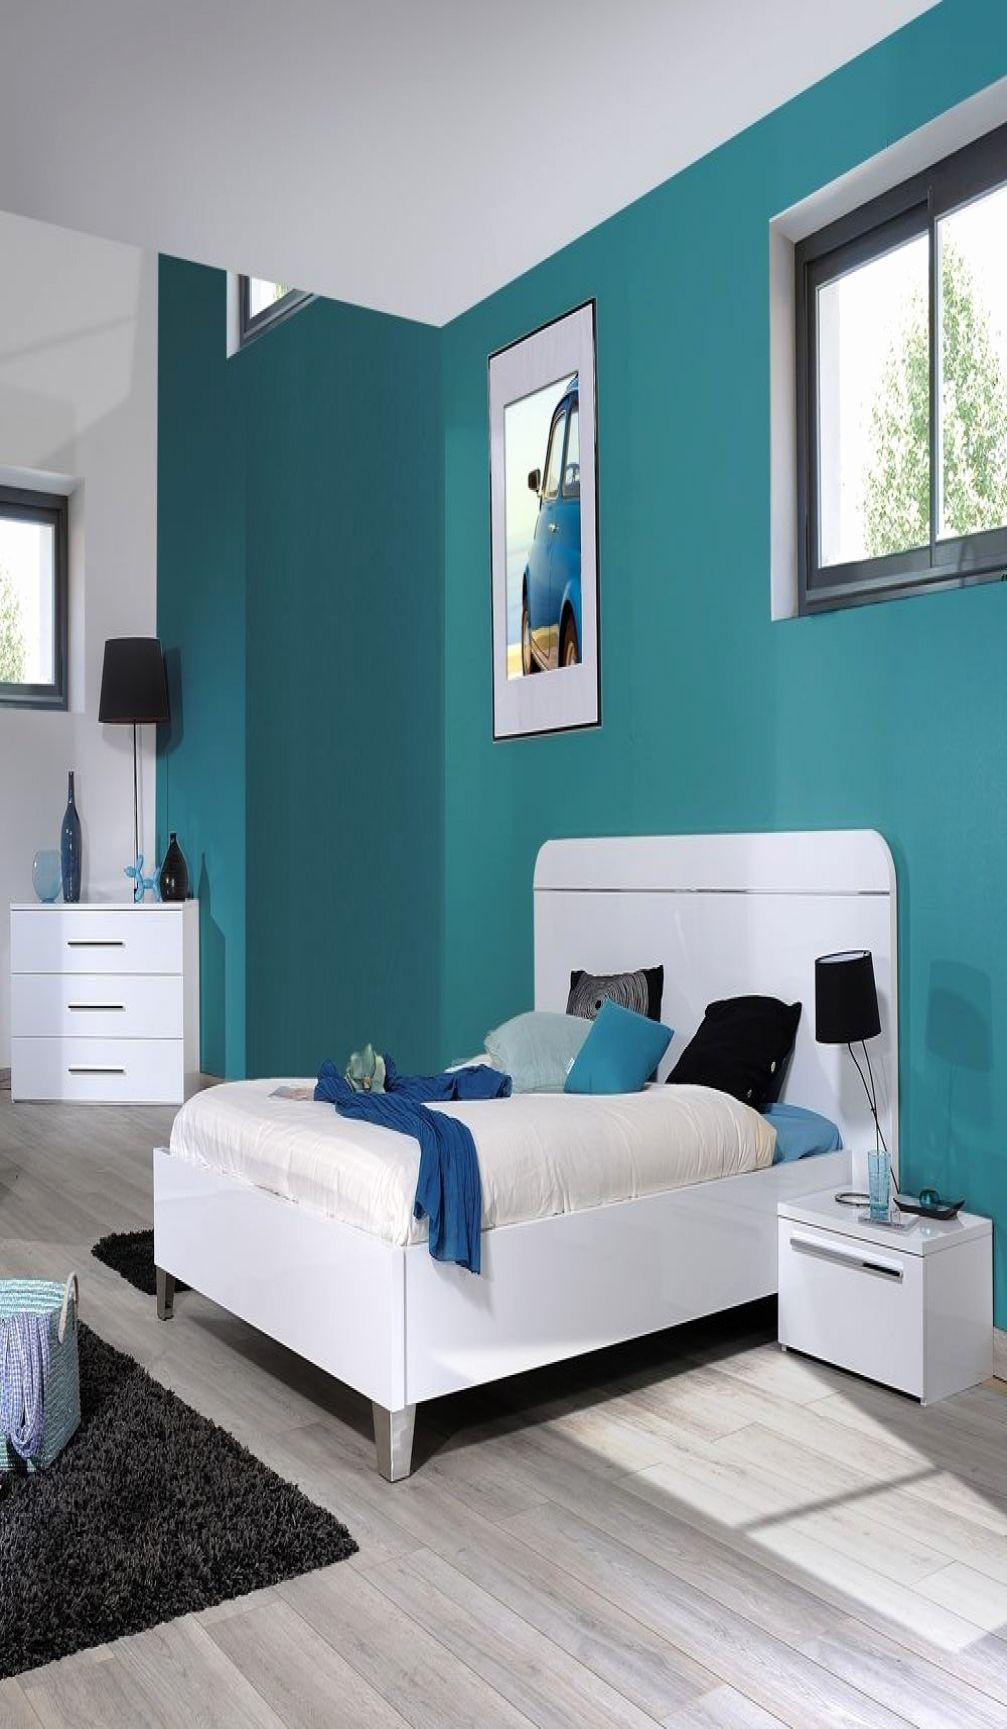 Merveilleux Chambres Conforama In 2020 Home Decor Furniture Home